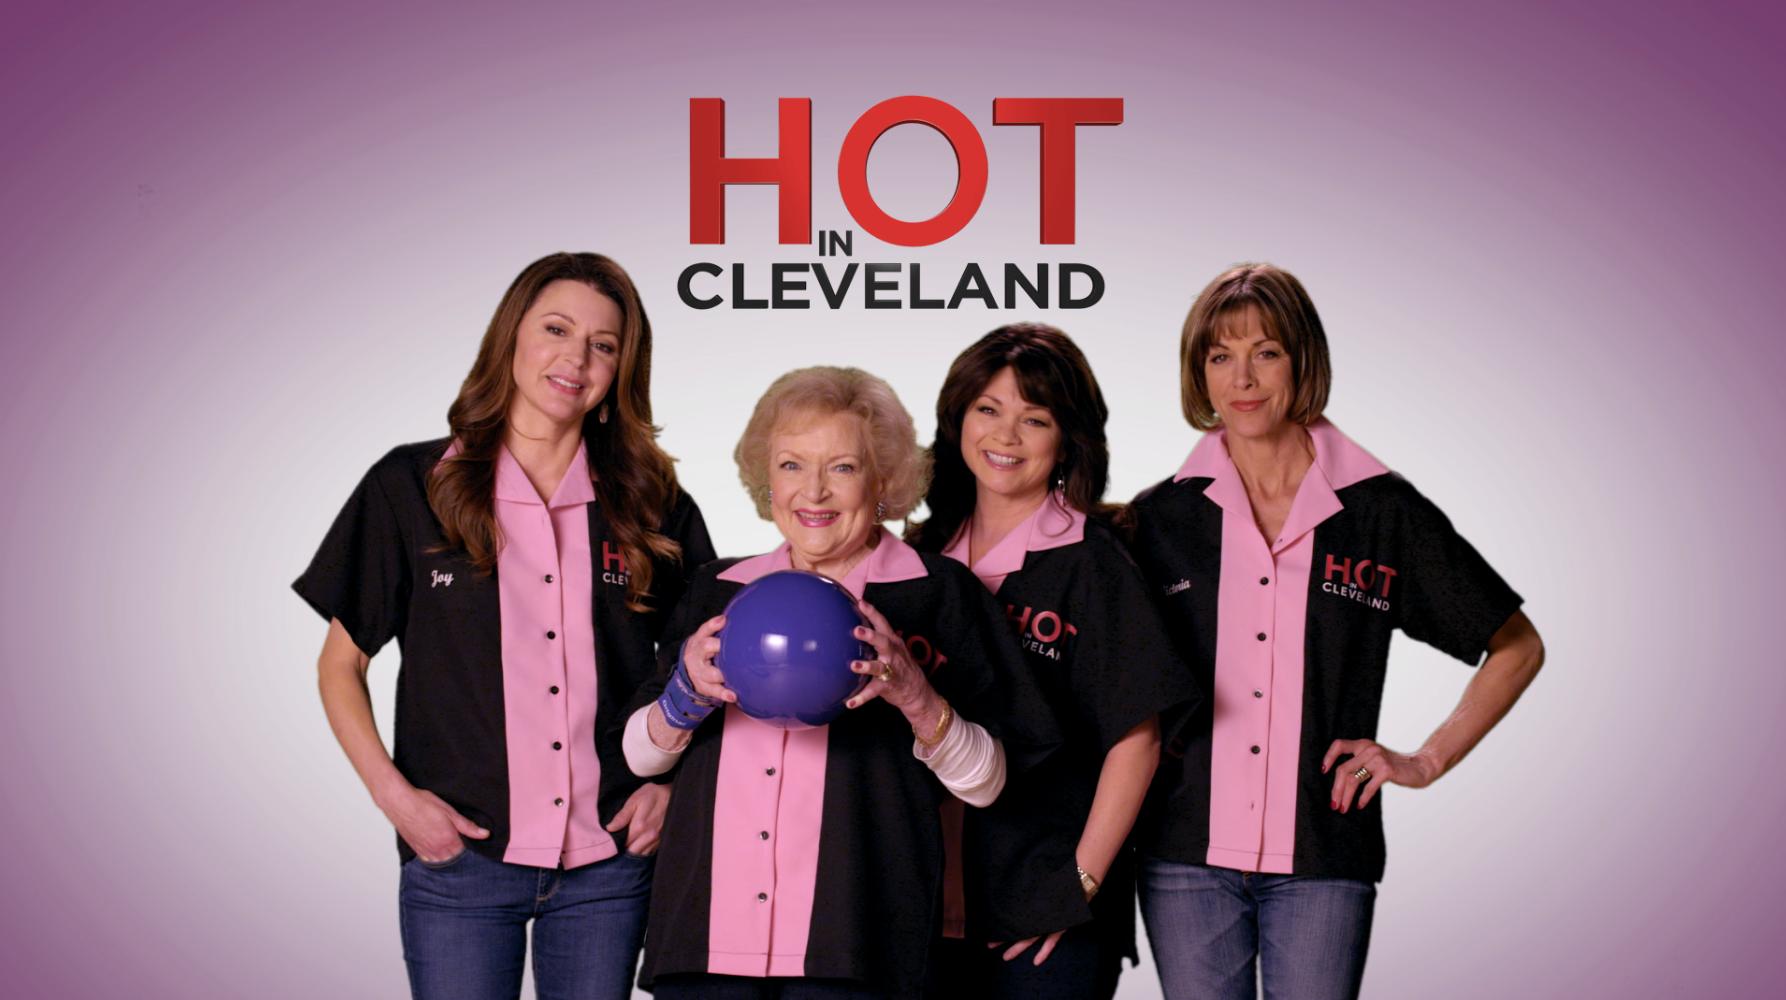 HOT IN CLEVELAND (TV30)